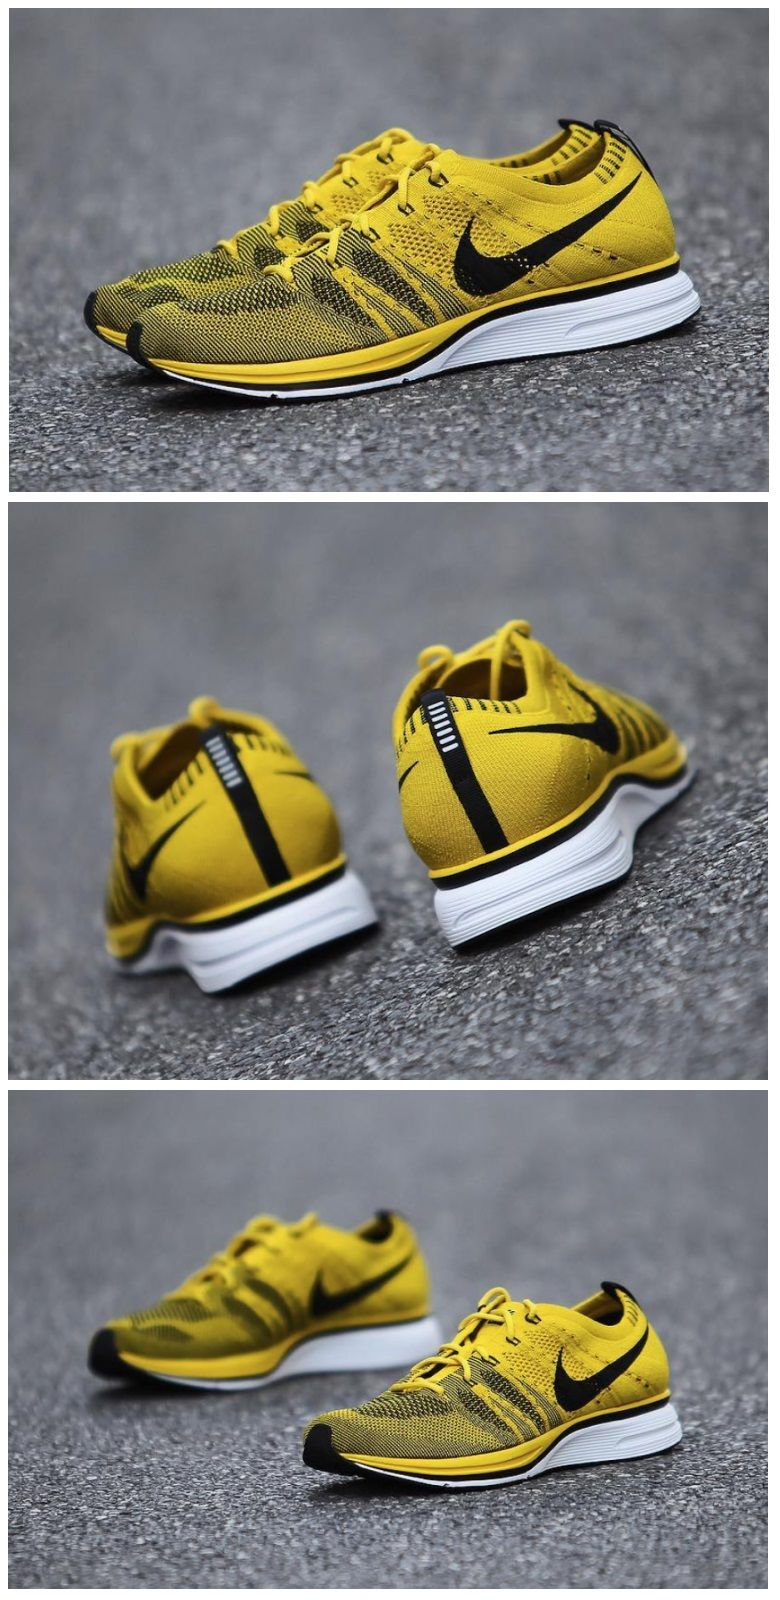 the best attitude c5695 b4f29 Nike Flyknit Trainer  Bright Citron